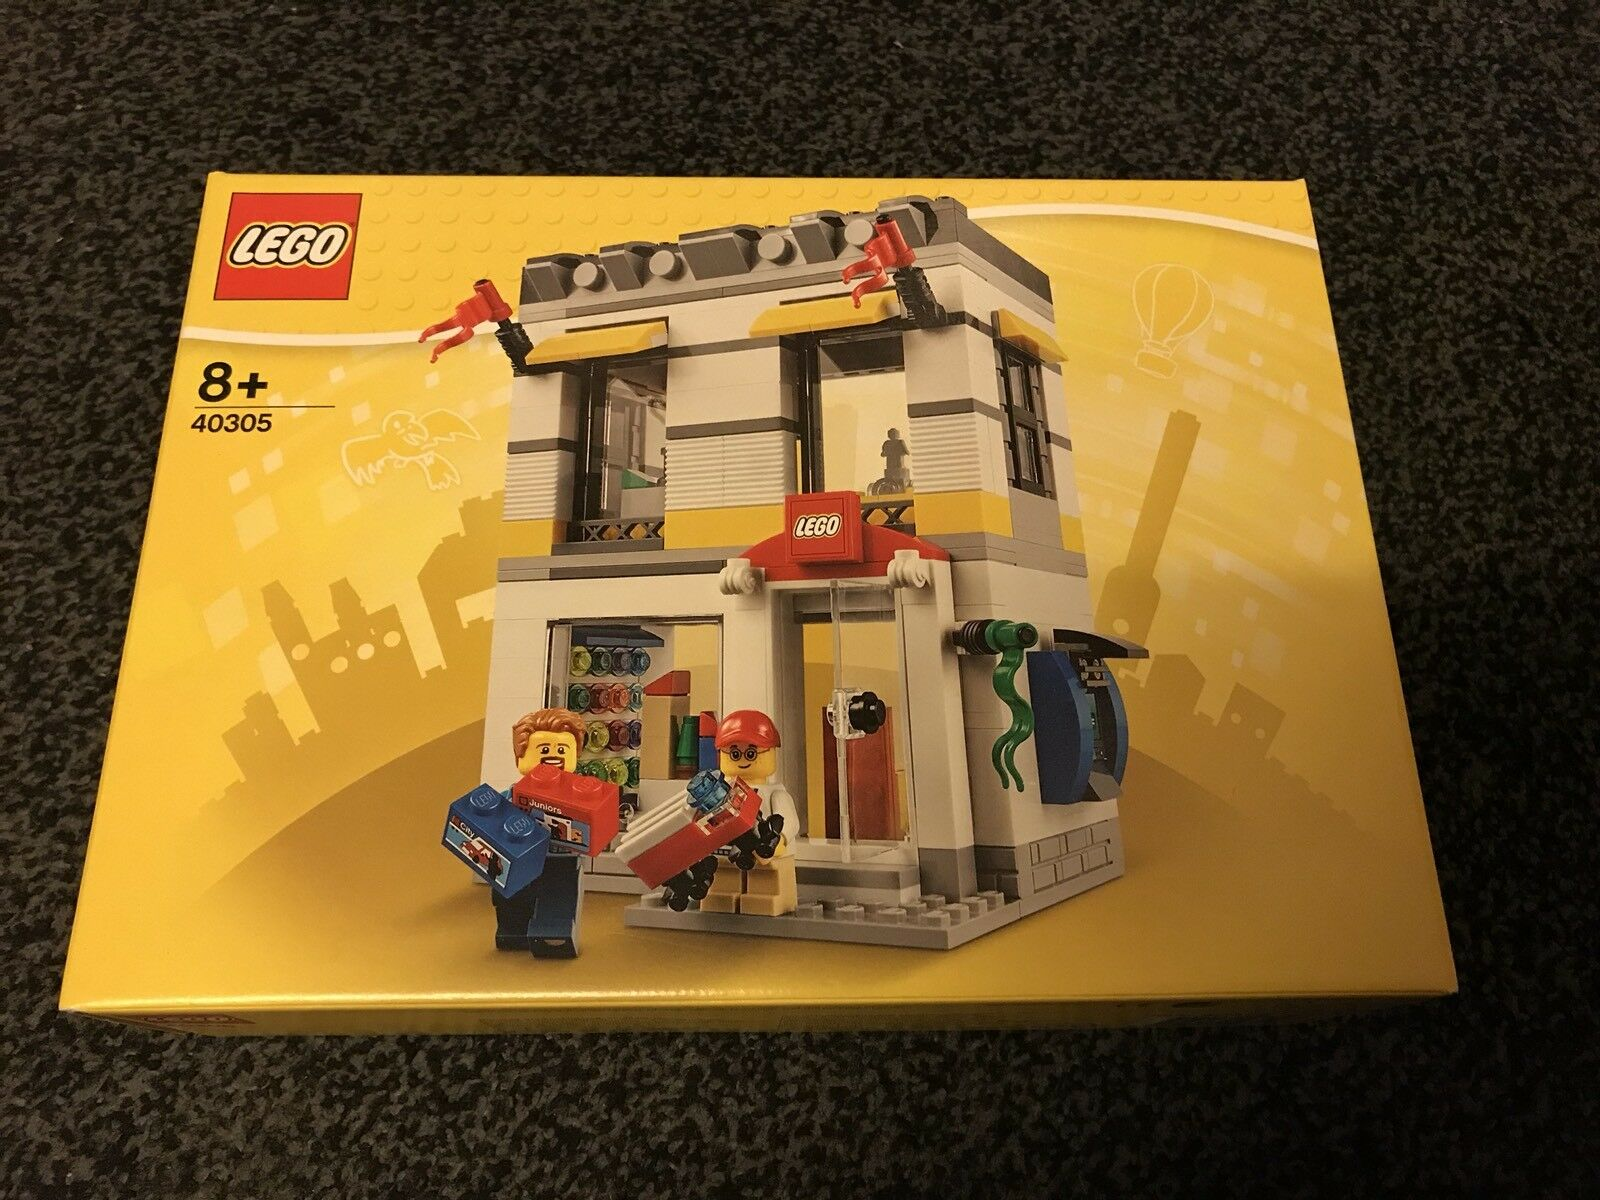 LEGO STORE SHOP BUILDING BRAND 40305 HARD TO FIND NEW GENUINE 2018 MINI FIGURE